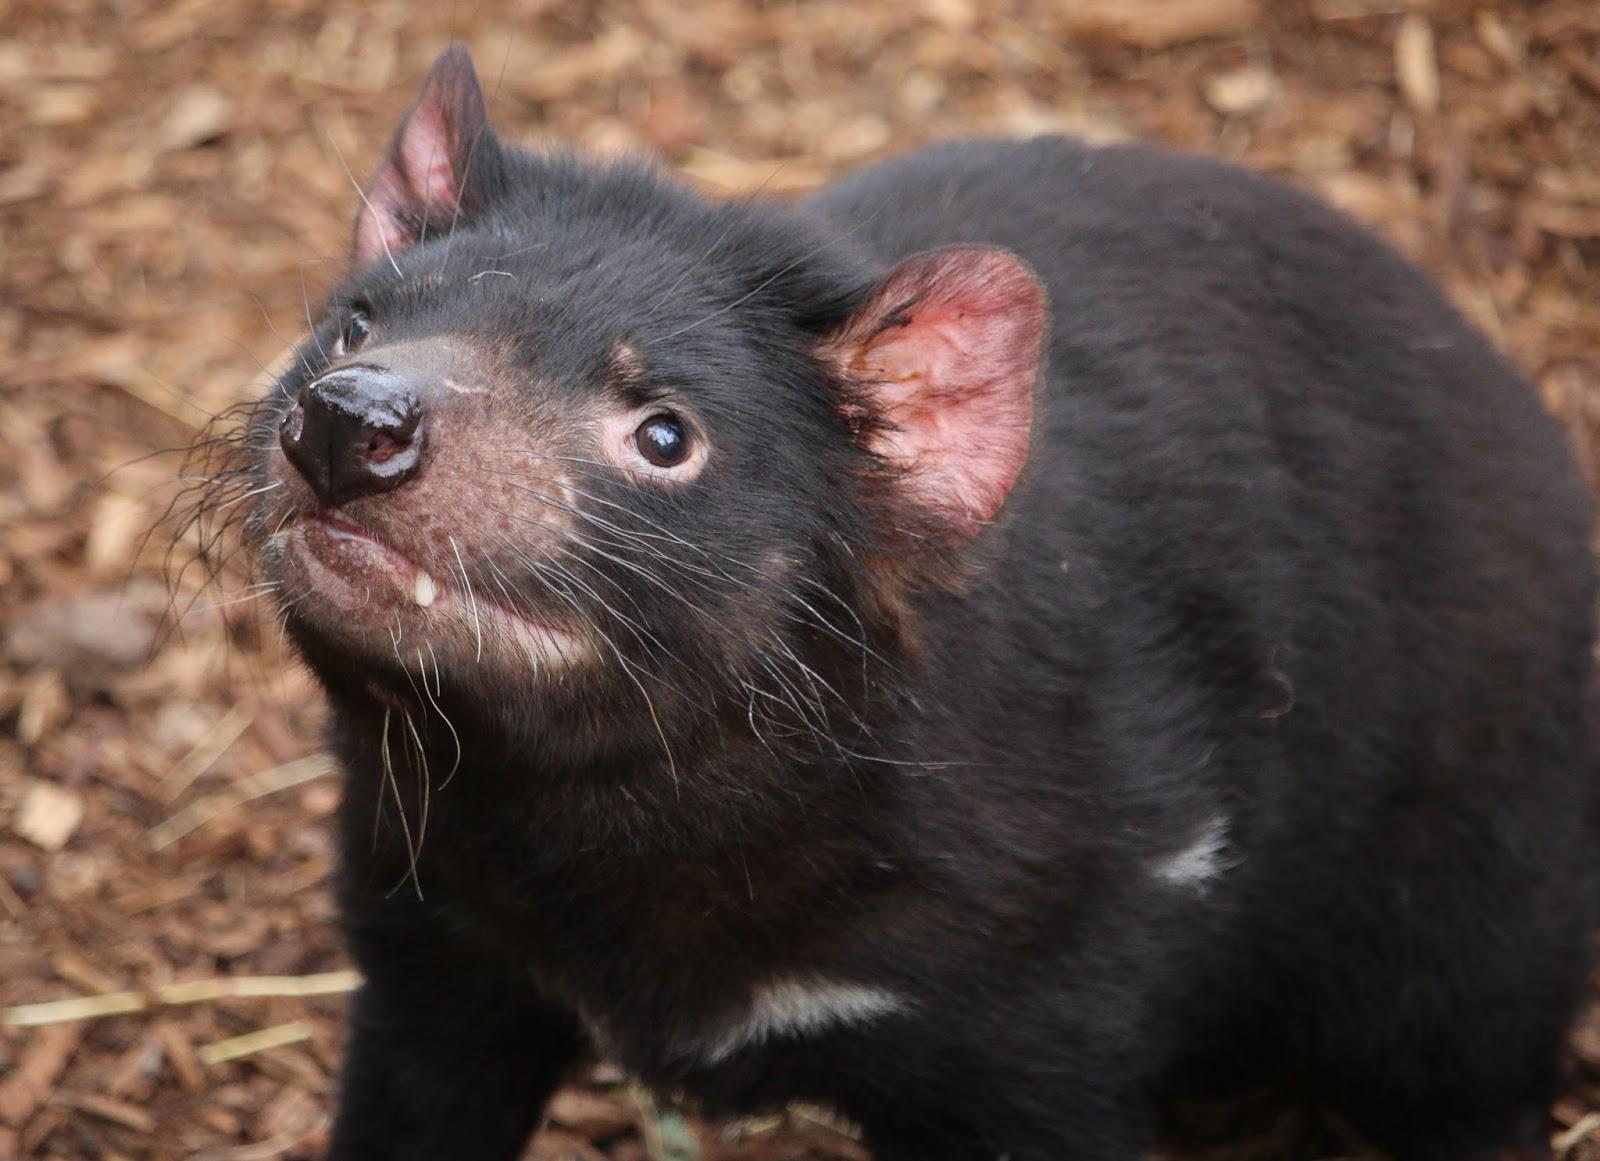 Expedition news - Tasmanian devil pics ...